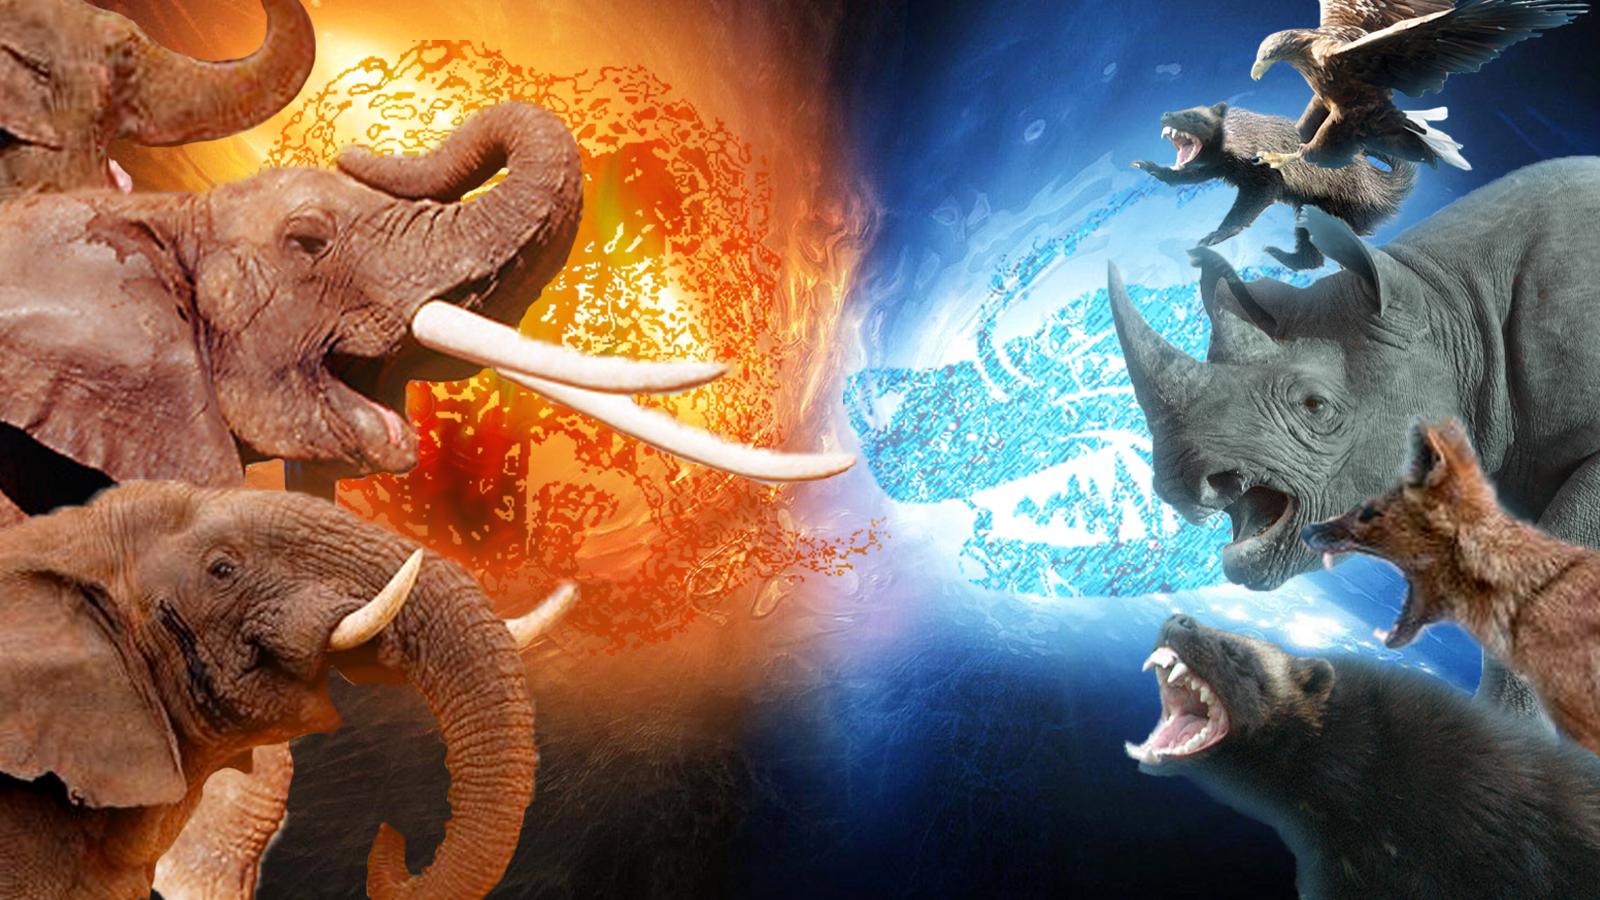 Far Cry 4 Wallpaper Elephant: MarioMiyamoto's Post